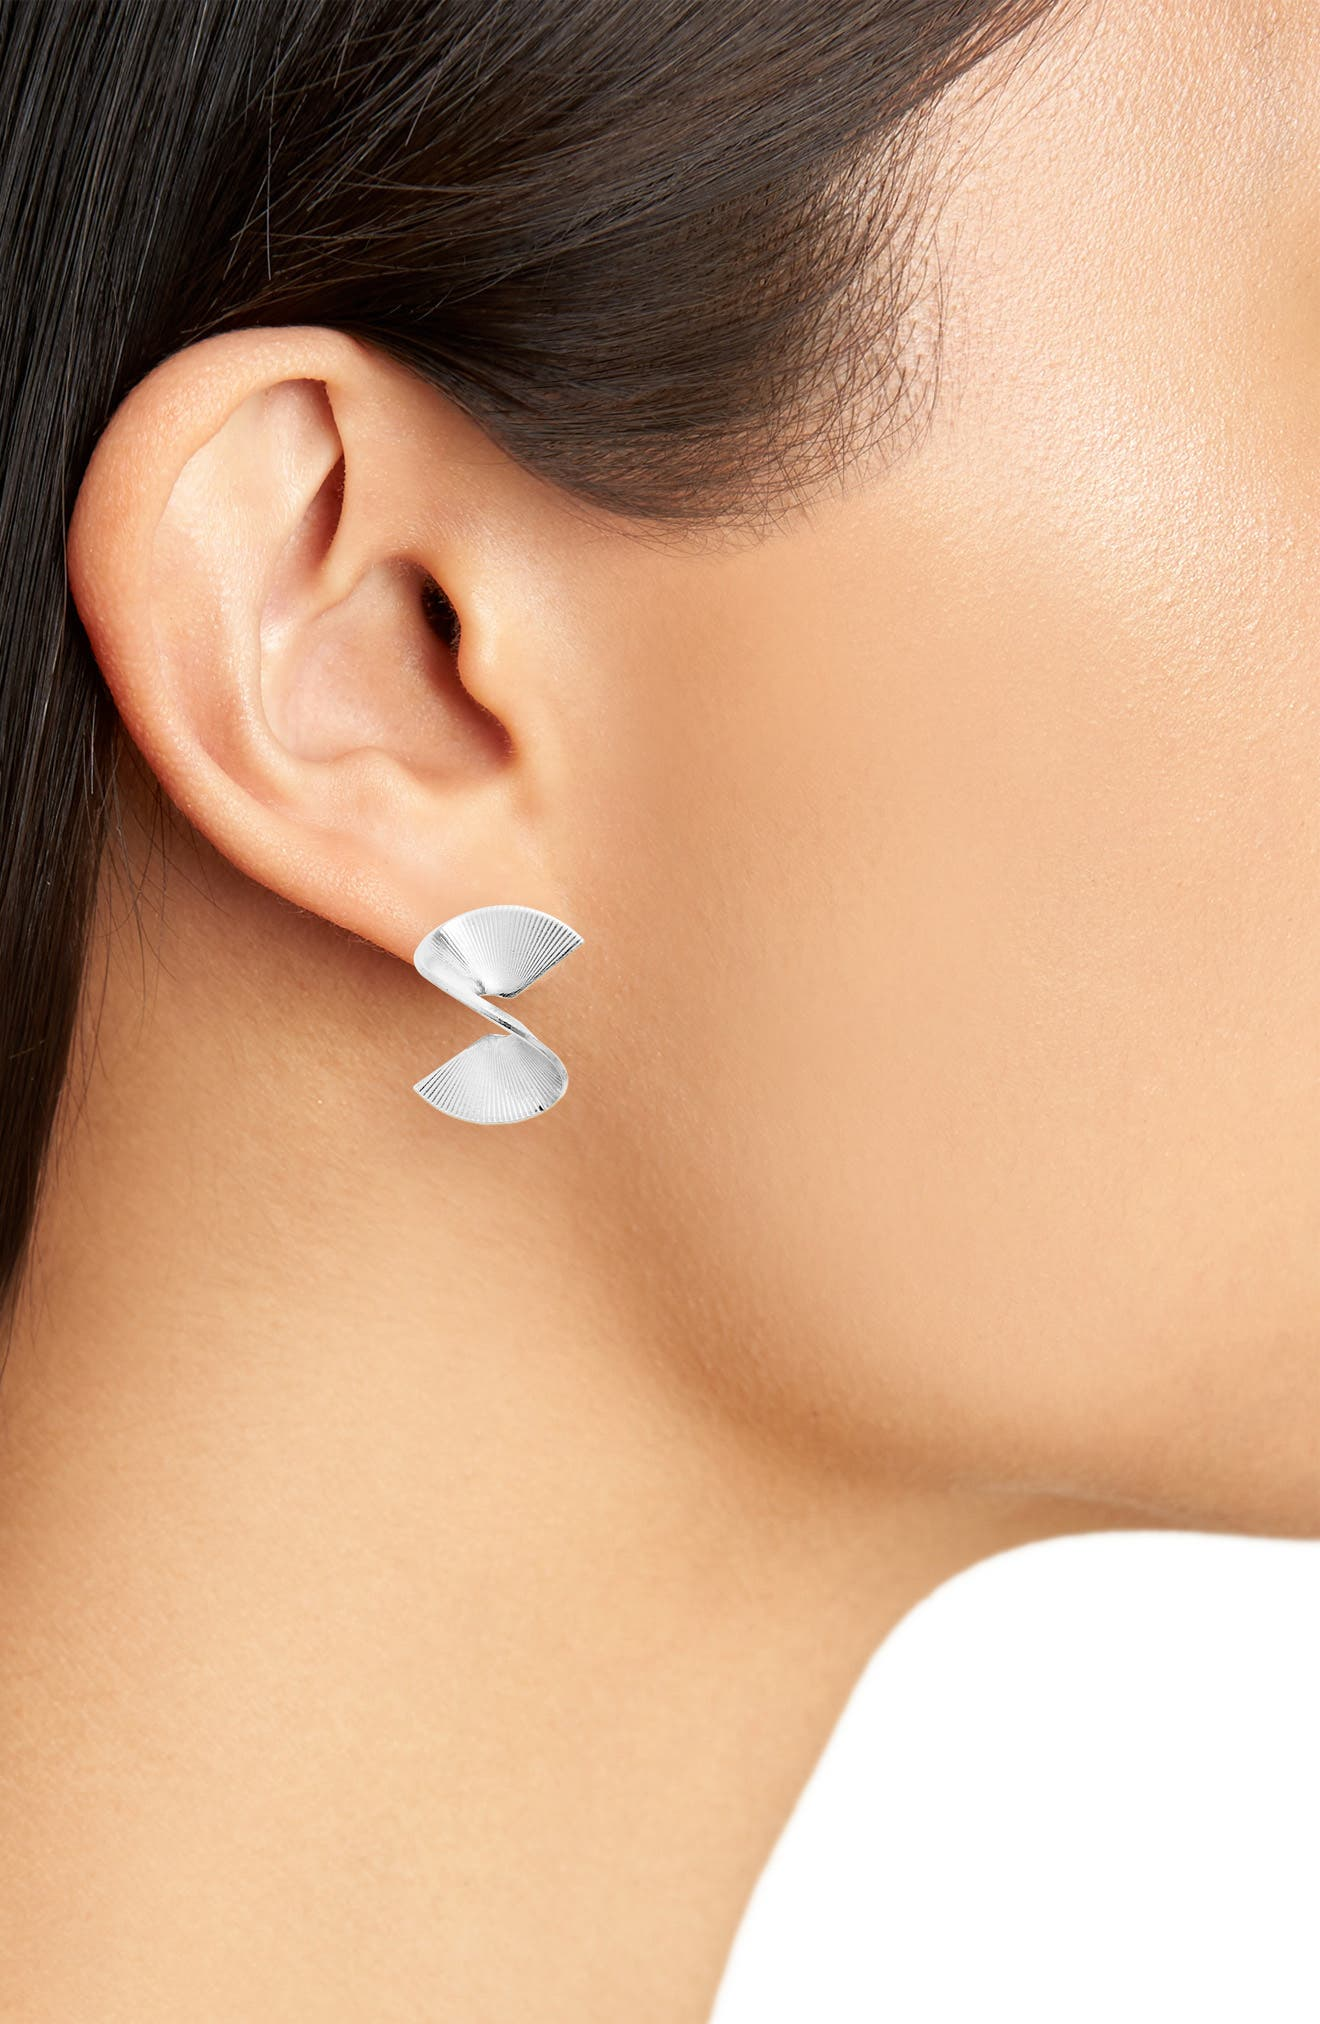 Solarwave Mini Stud Earrings,                             Alternate thumbnail 2, color,                             SILVER